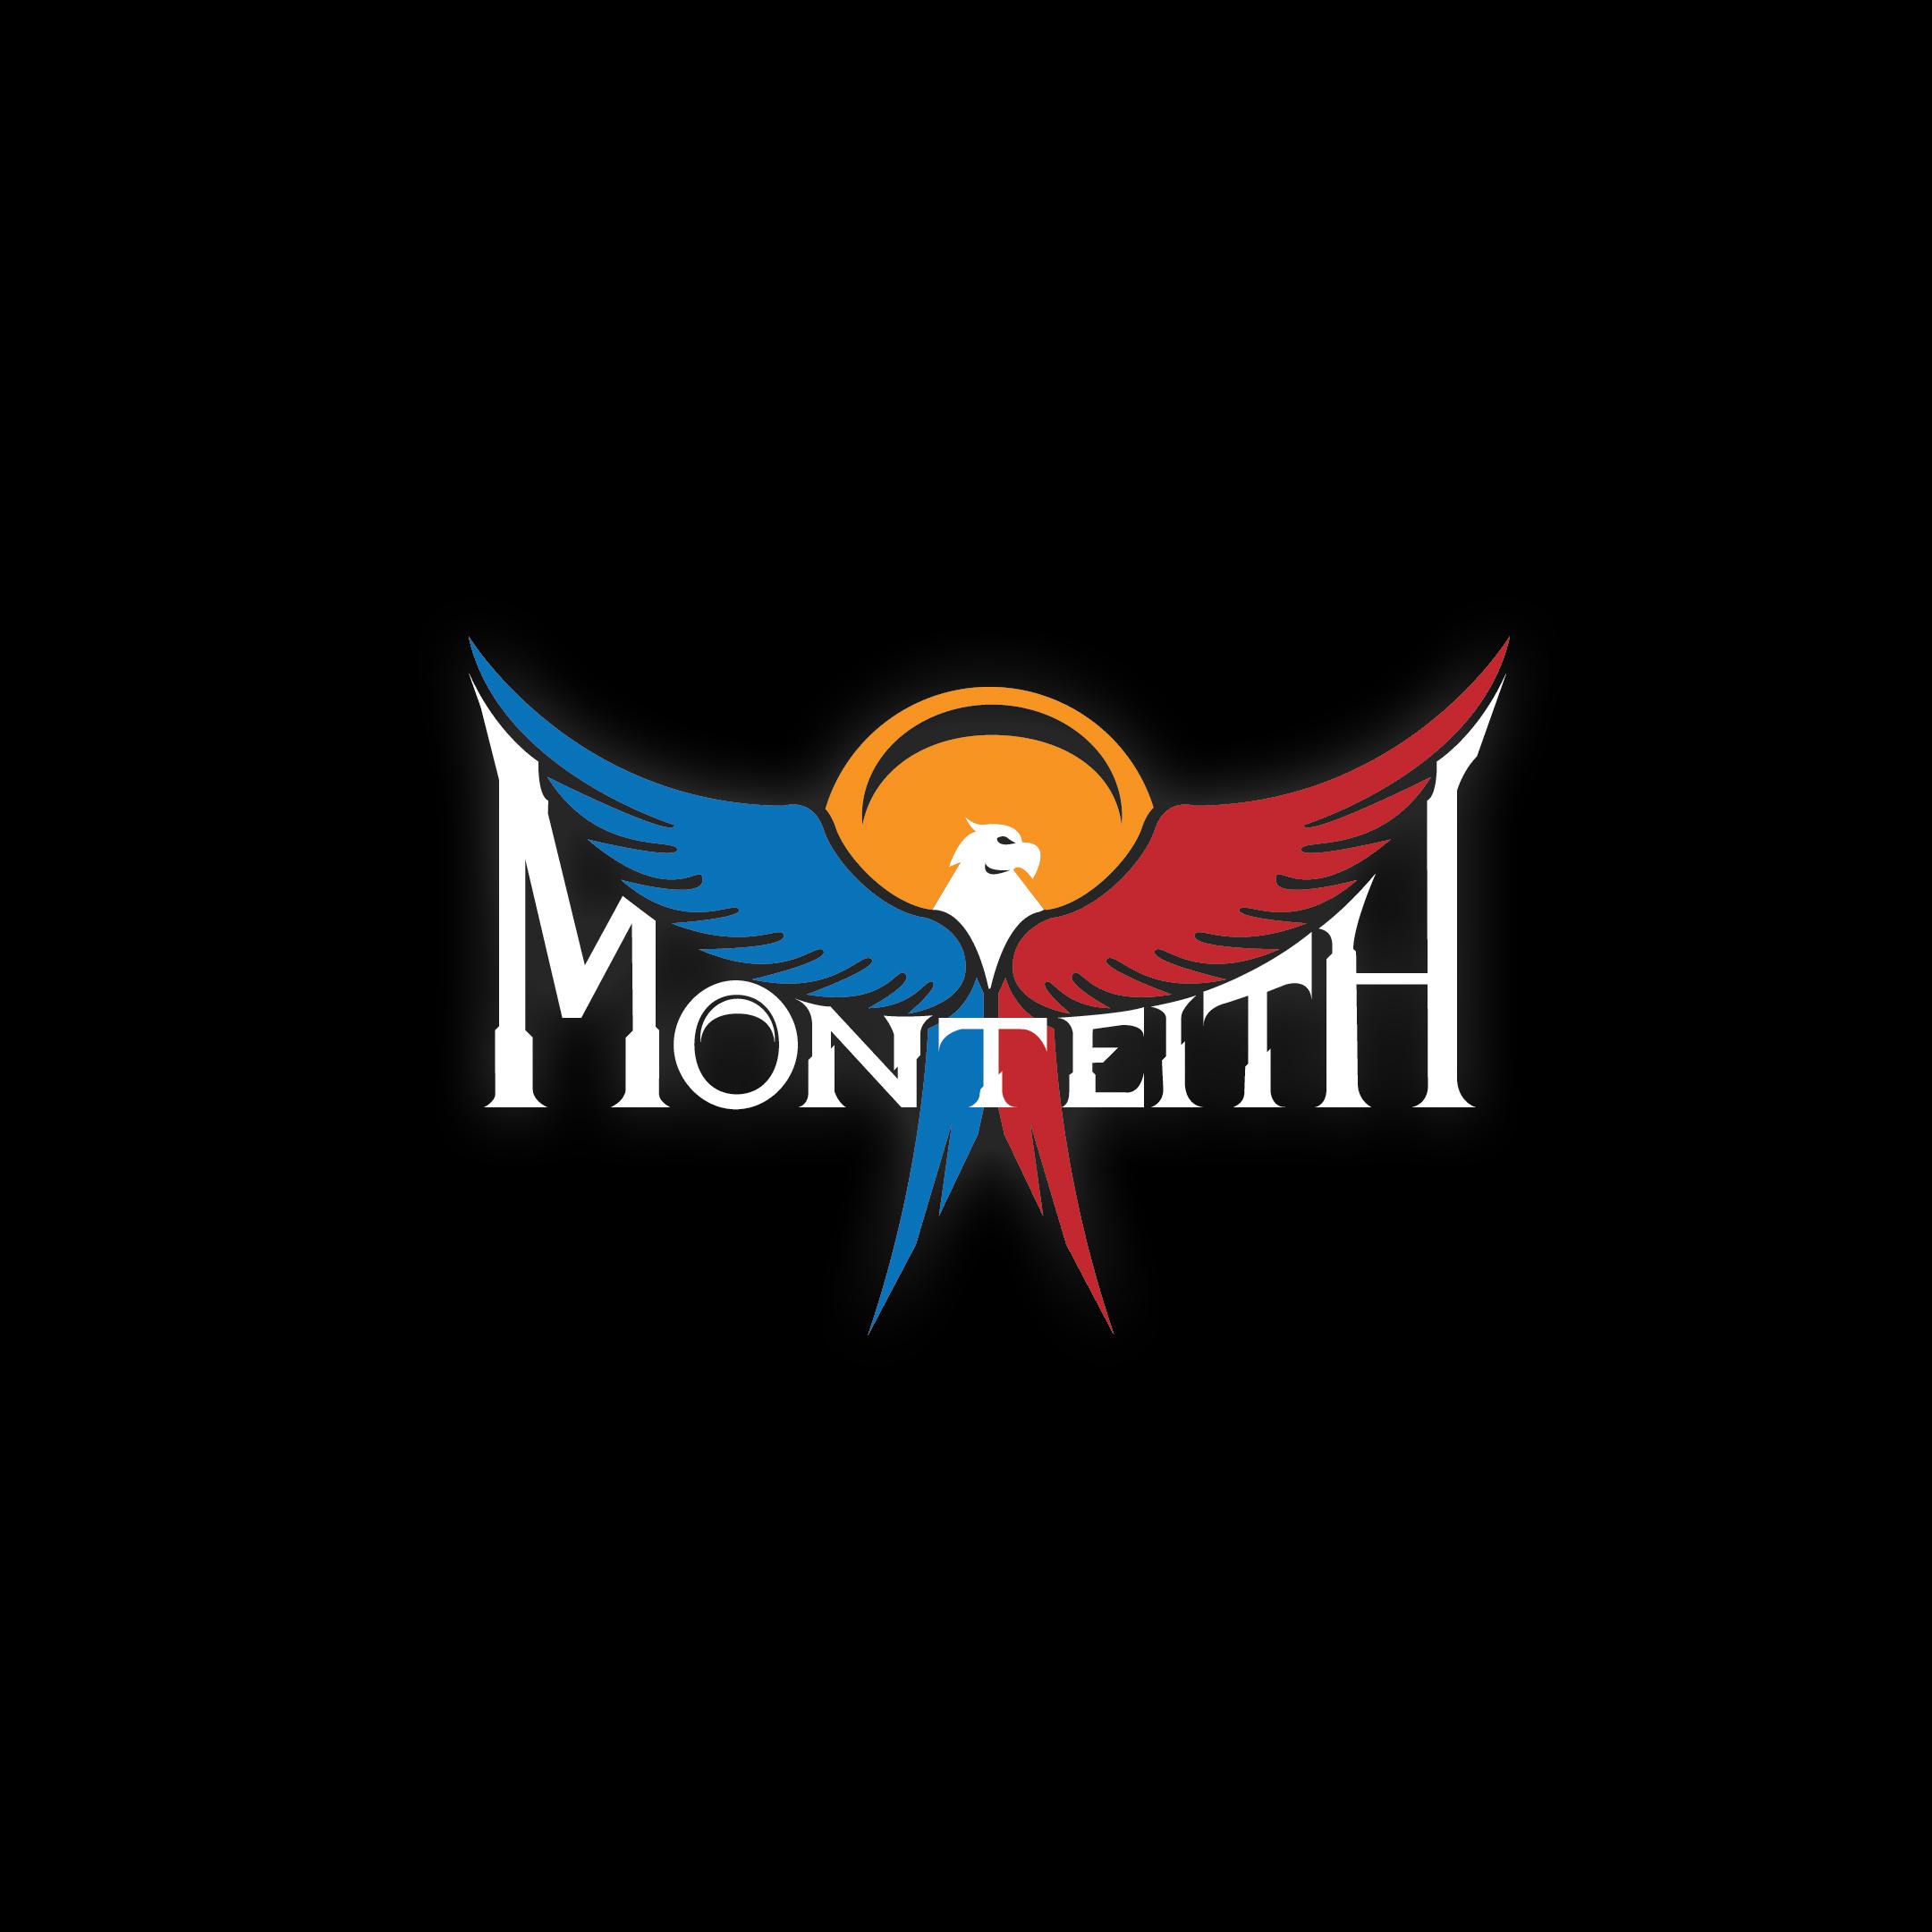 5584722_149650578572_MonteithAlbumFrontCover.jpg